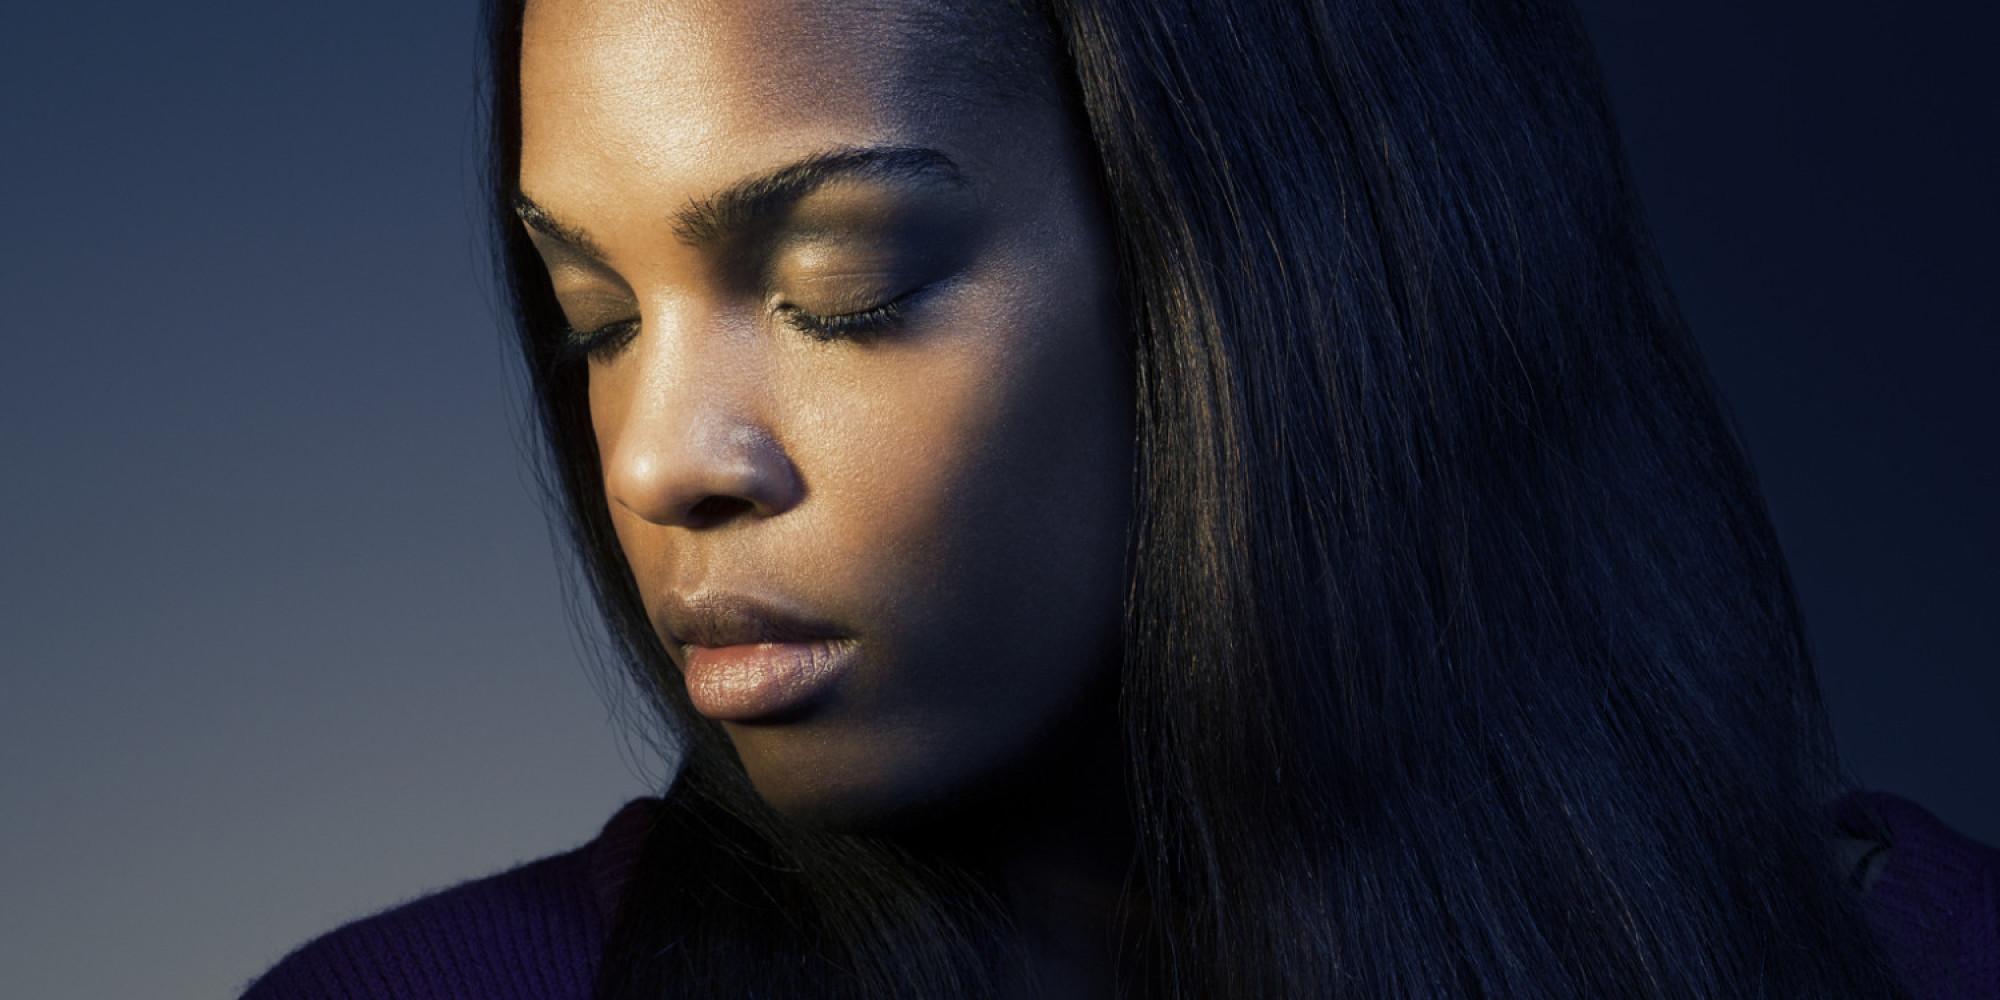 black-woman-sad.jpg